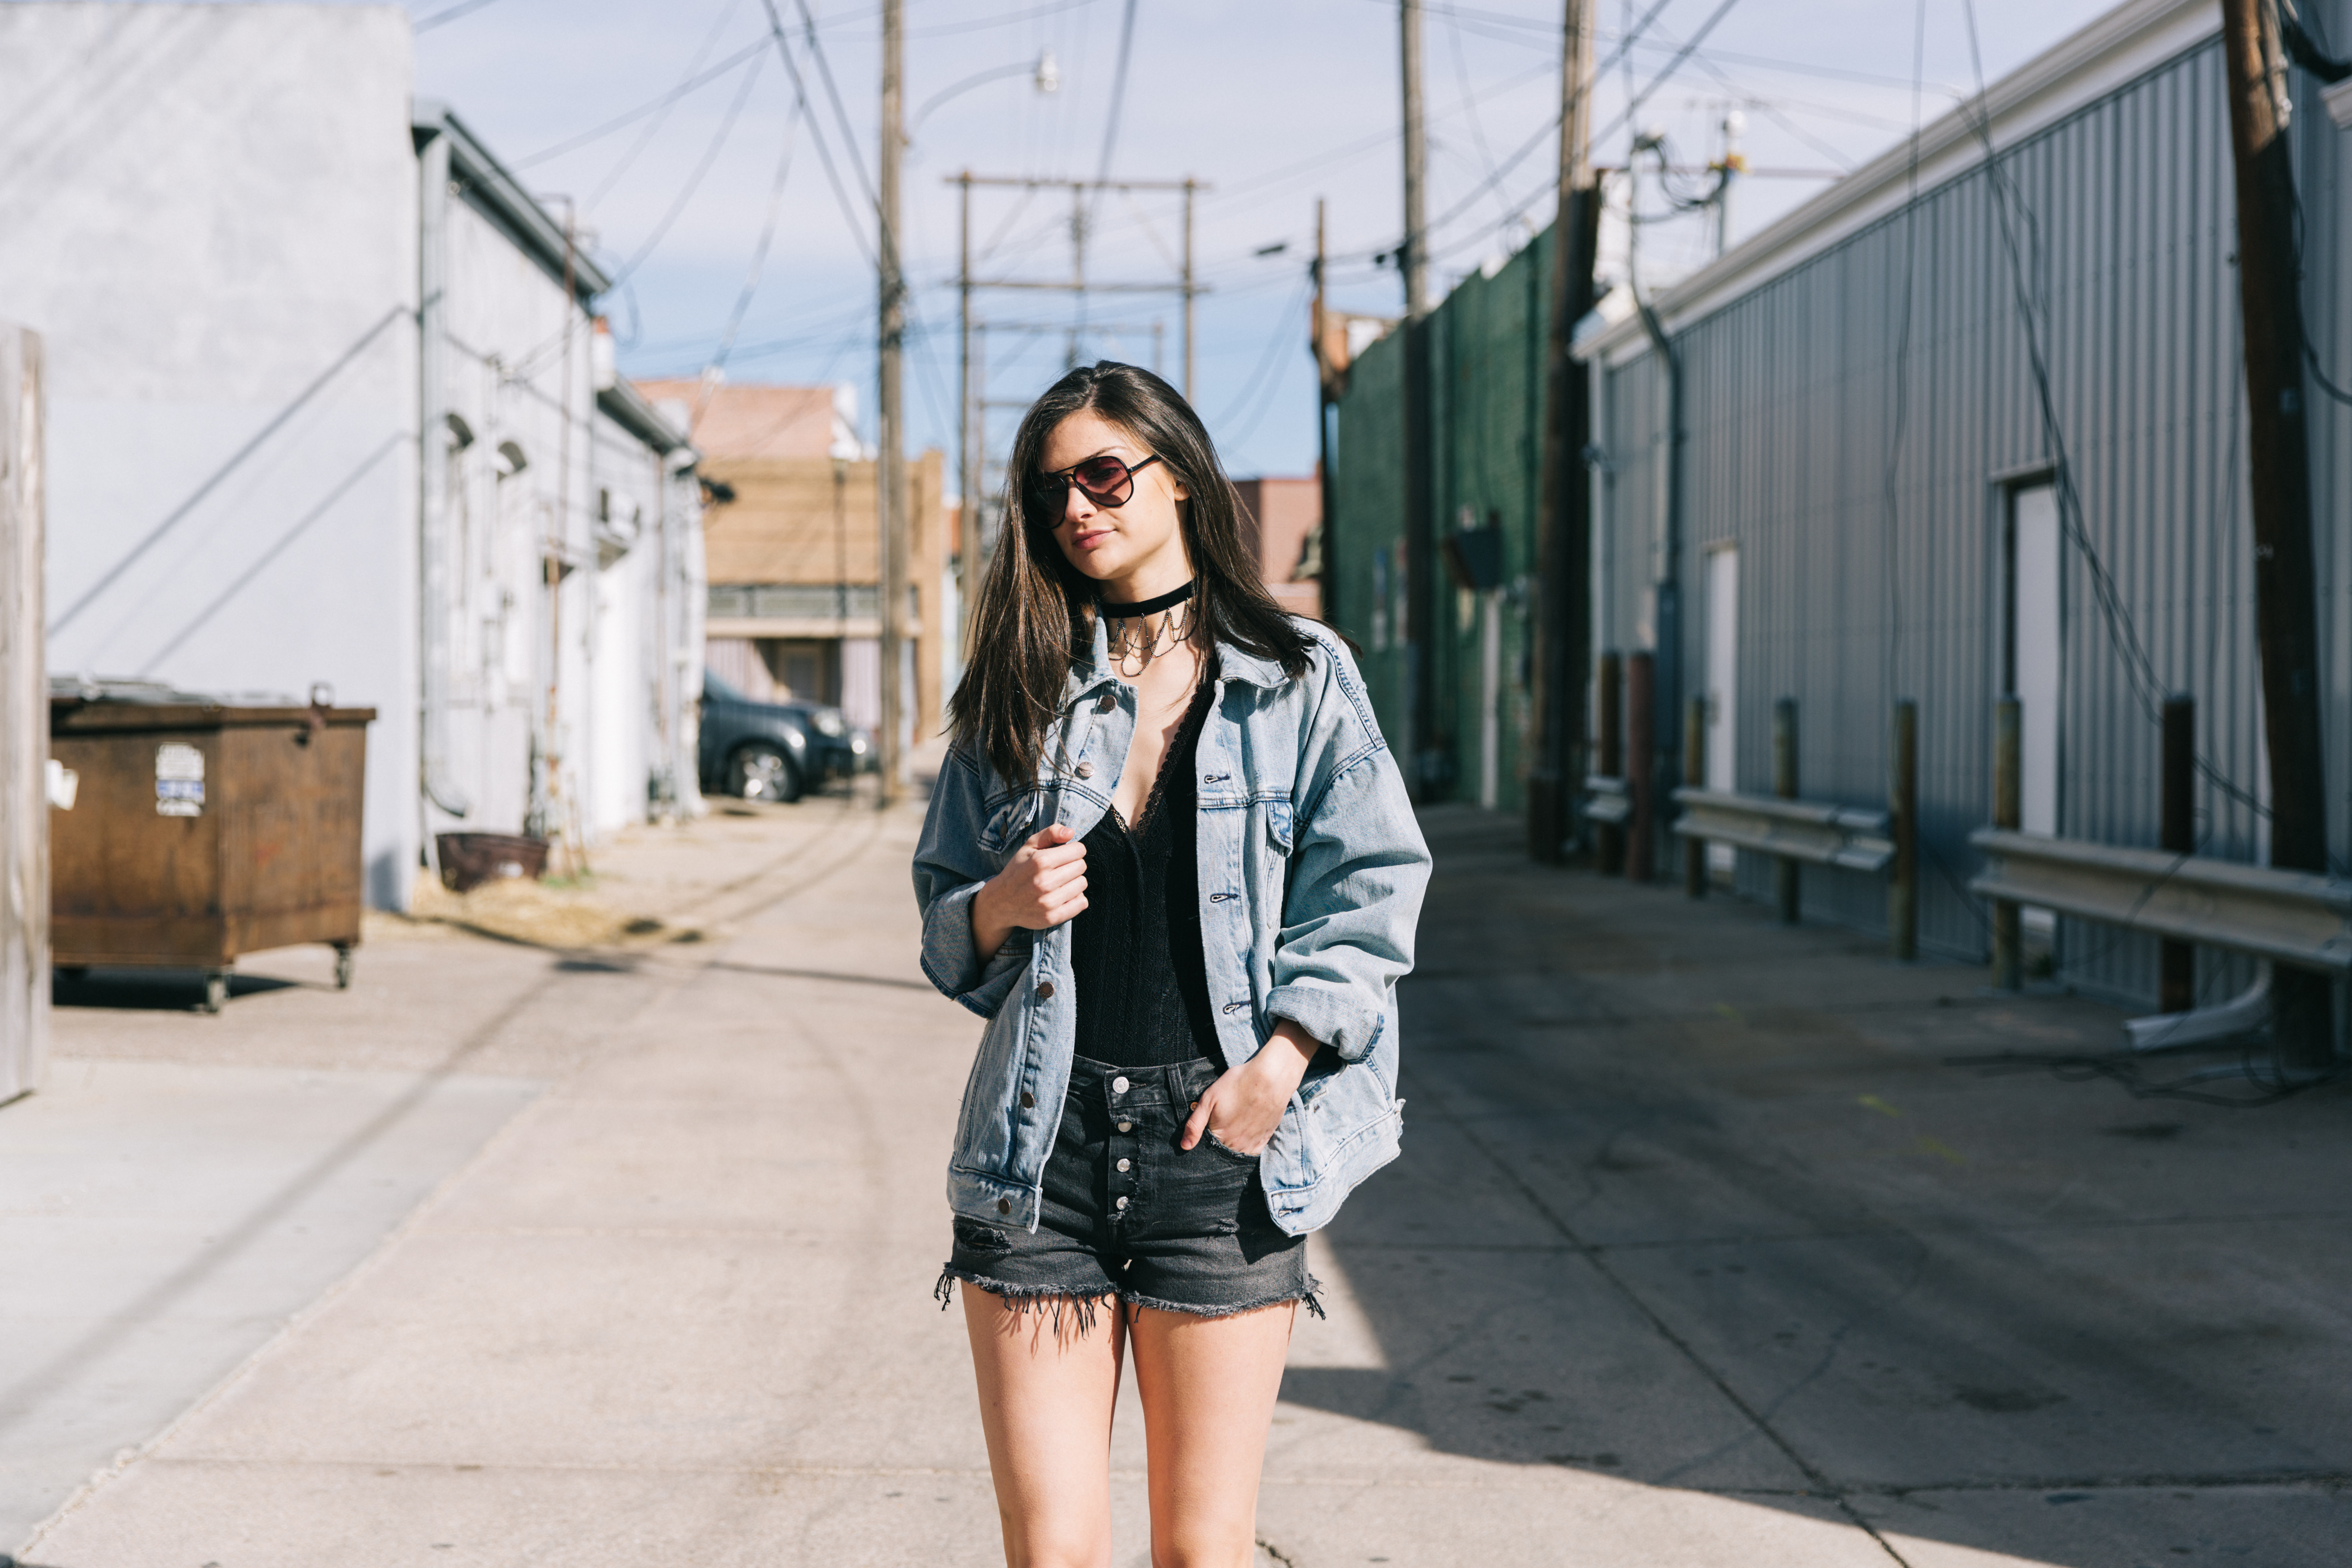 Woman in alleyway styled in oversized denim jacket, bodysuit, and black denim shorts with raw hemline.